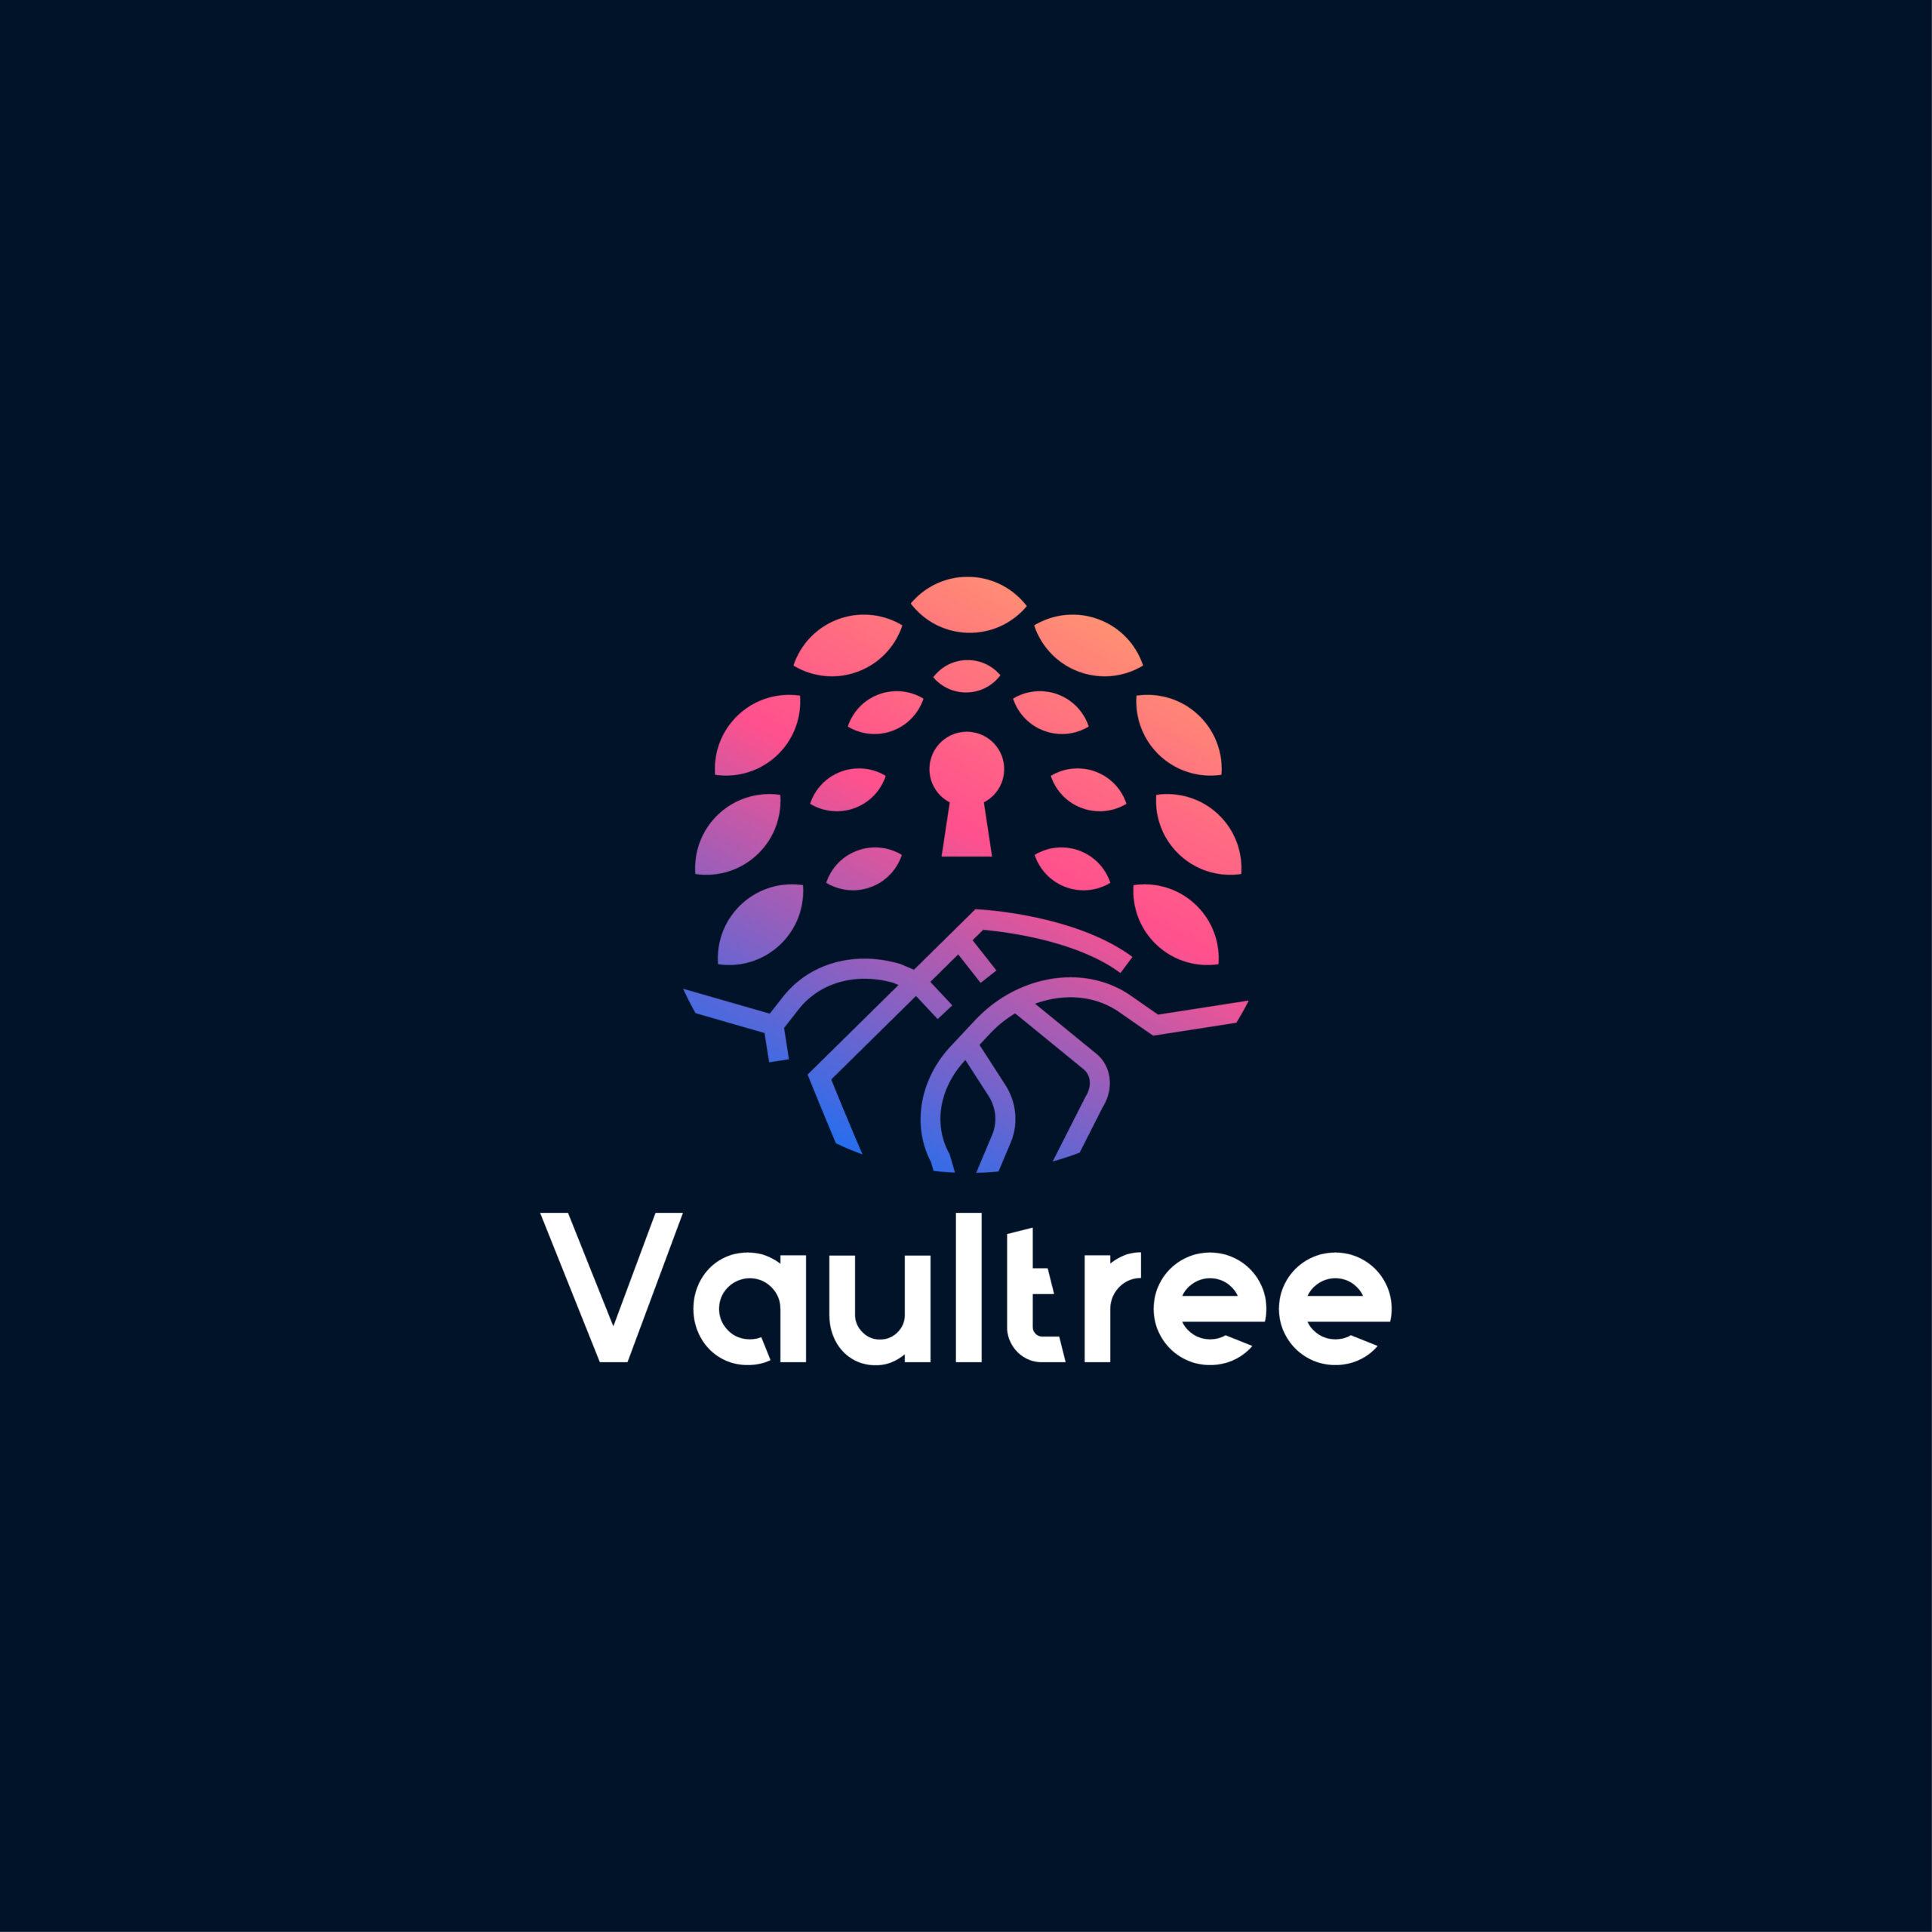 Vaultree Logo